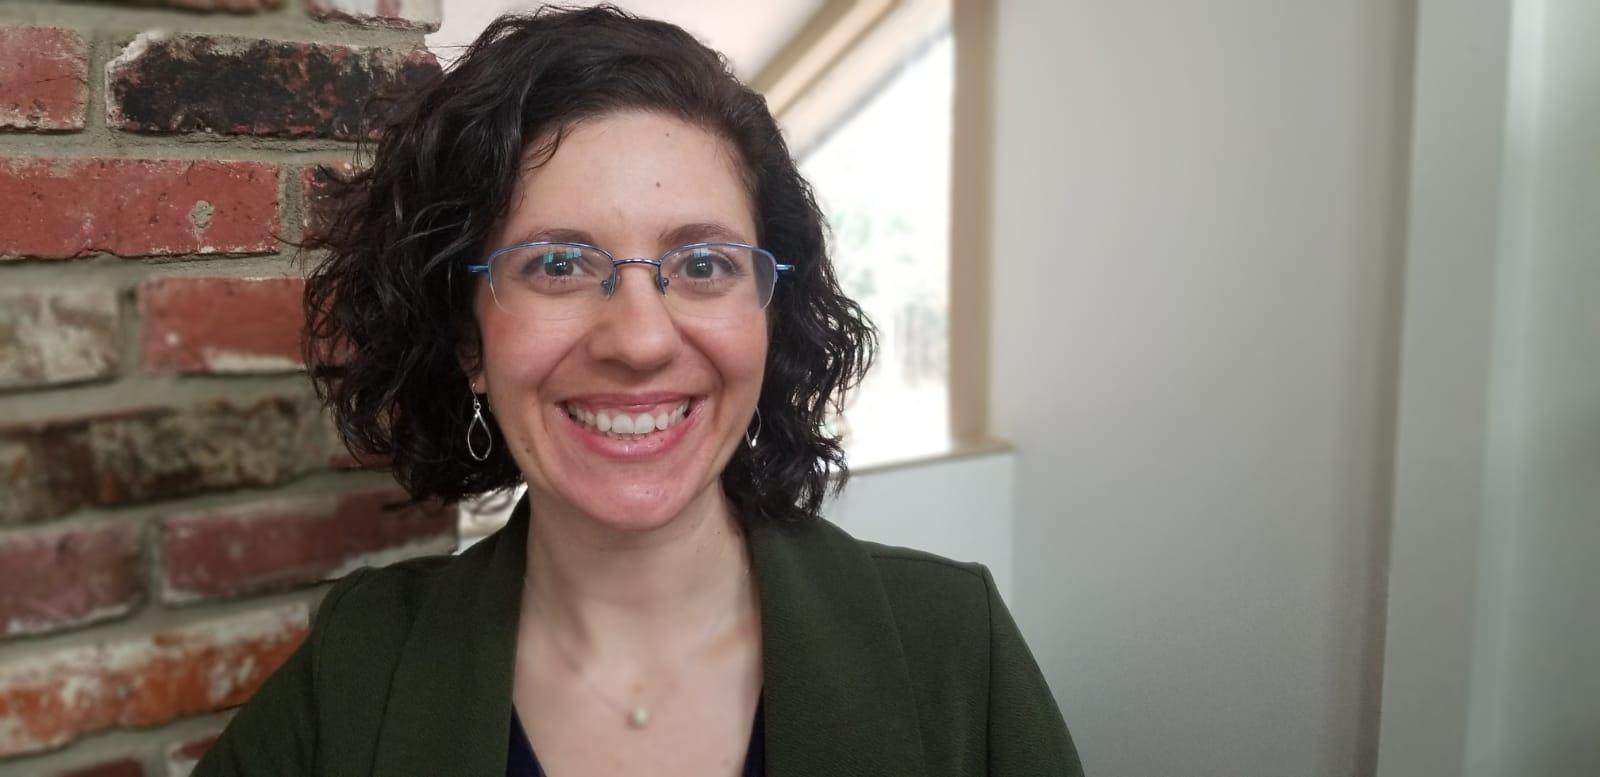 Alicia B. Kiremire